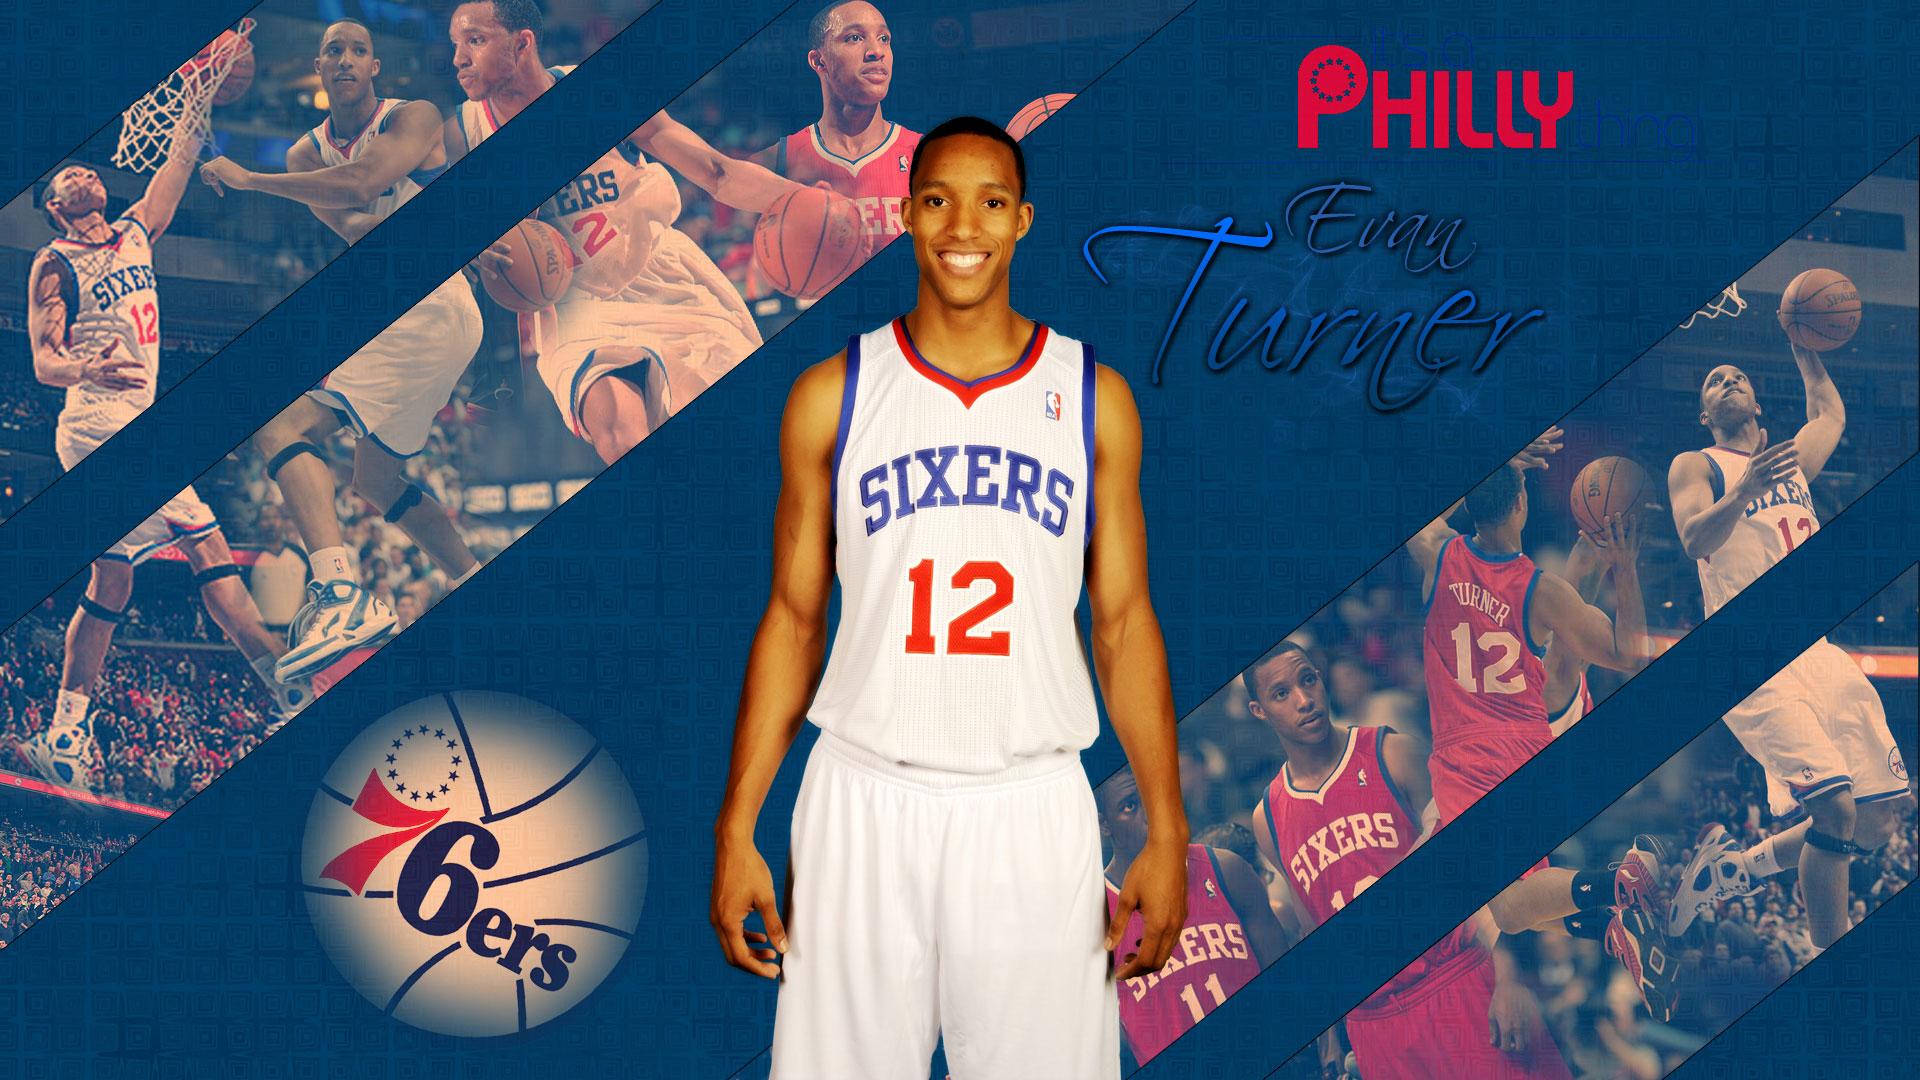 Iphone X Philadelphia Eagles Wallpaper Hd 76ers Wallpaper Pixelstalk Net